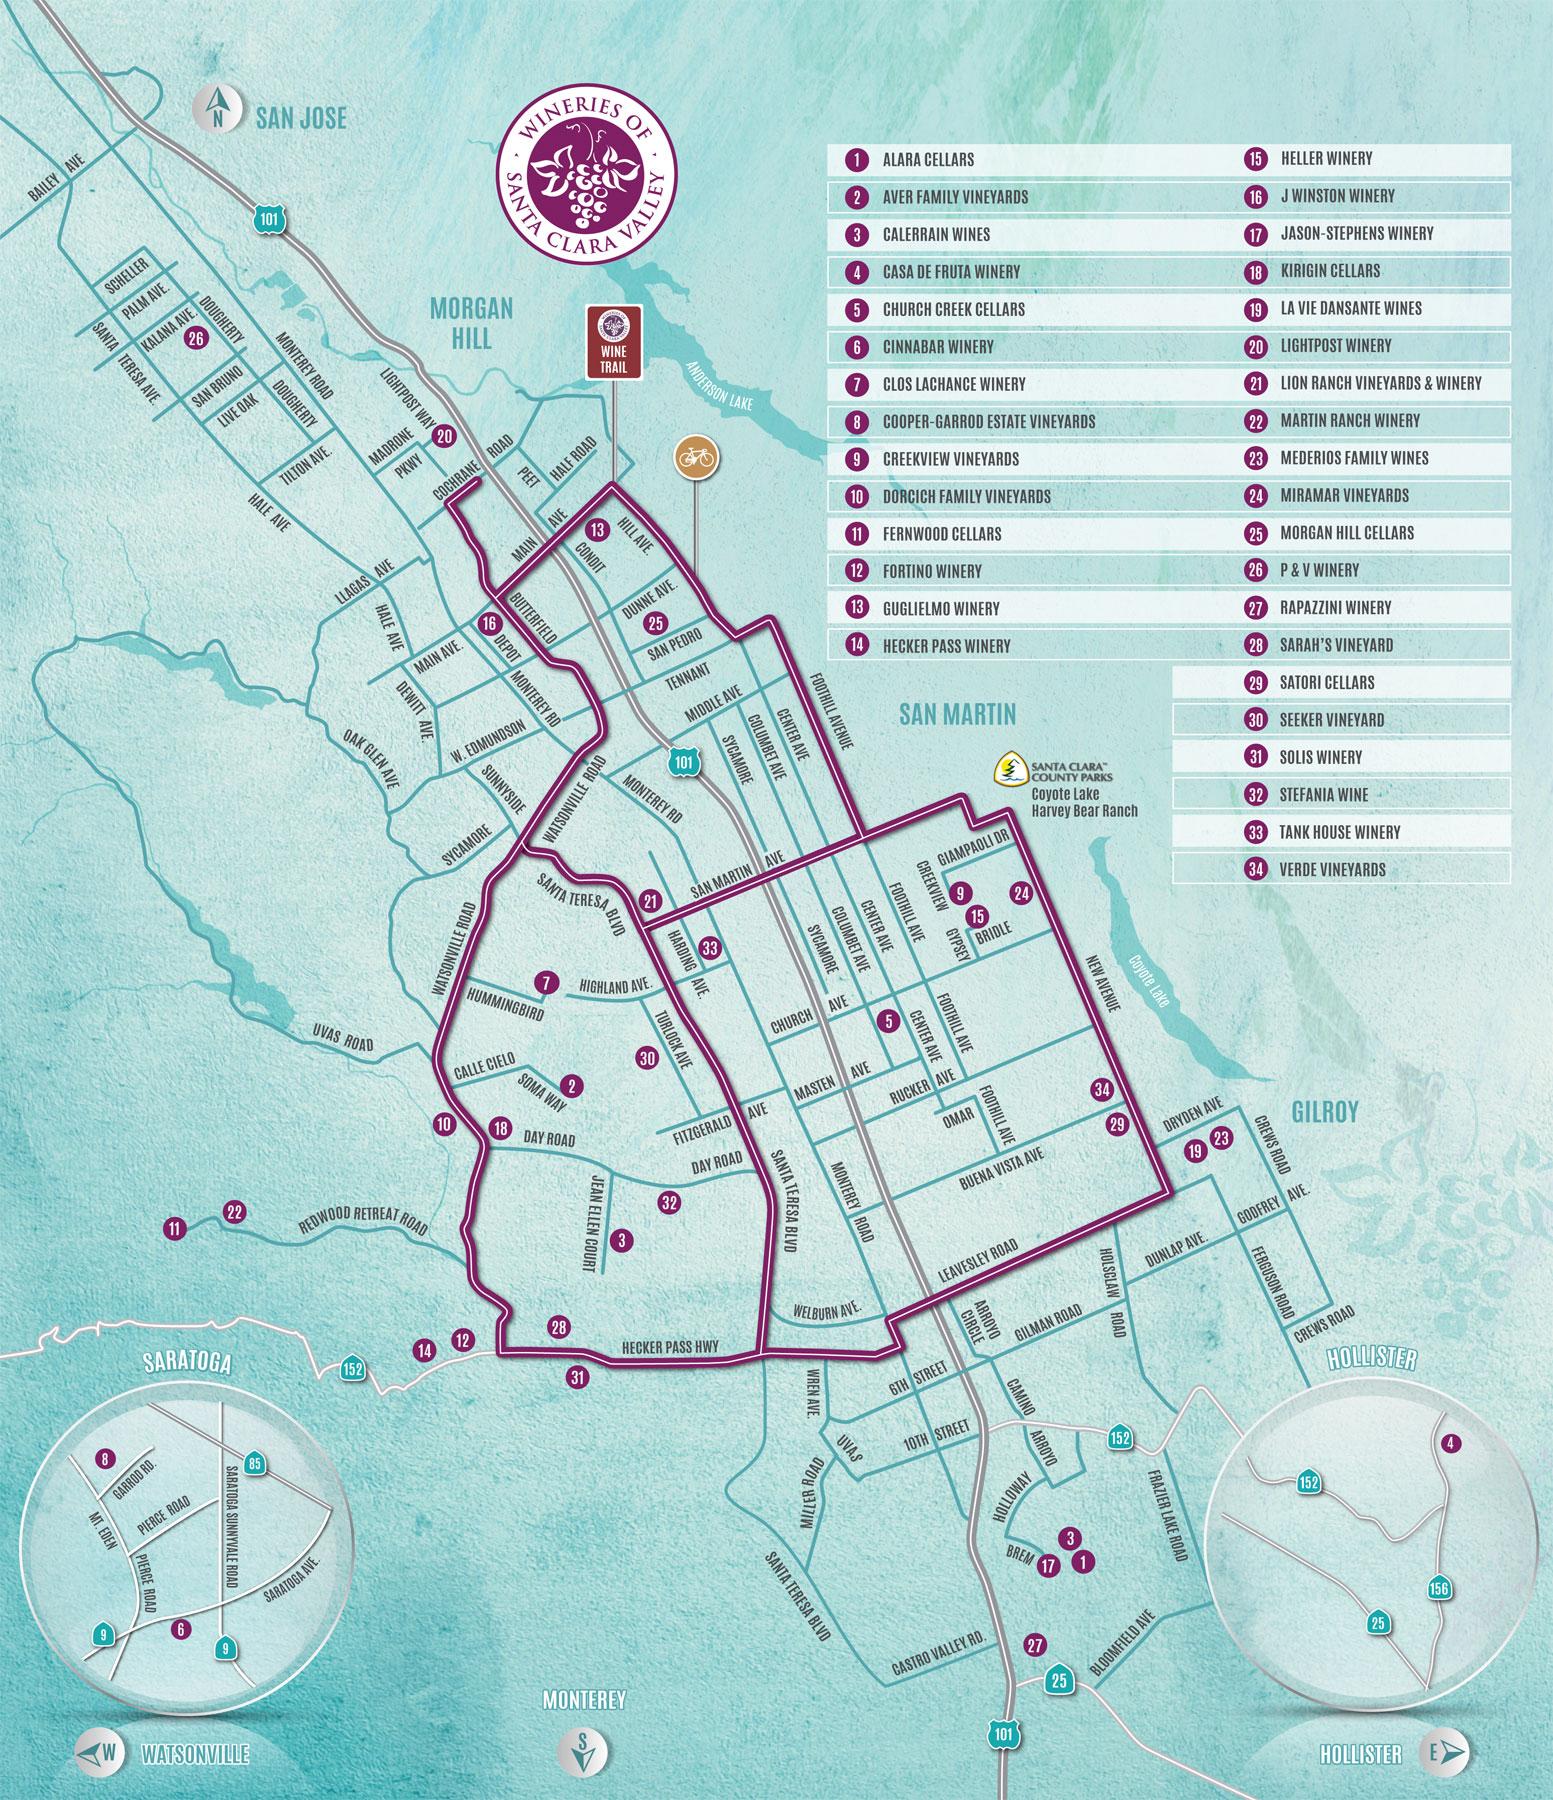 2019 Wineries of Santa Clara Valley Map